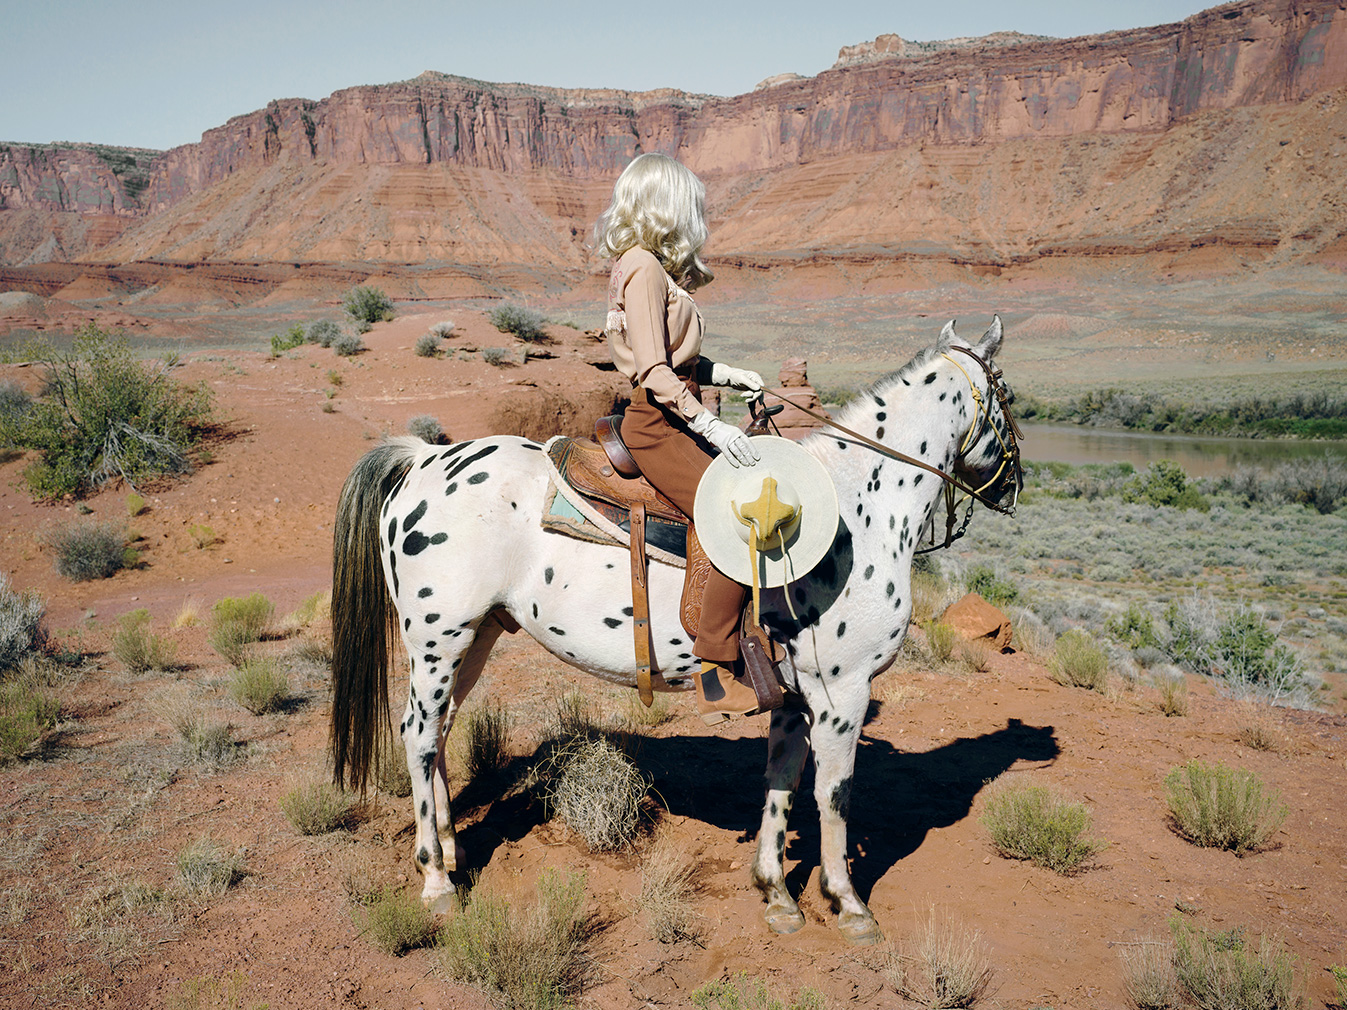 'The Imaginary Cowboy'. Photography: Anja Niemi (c) 2019